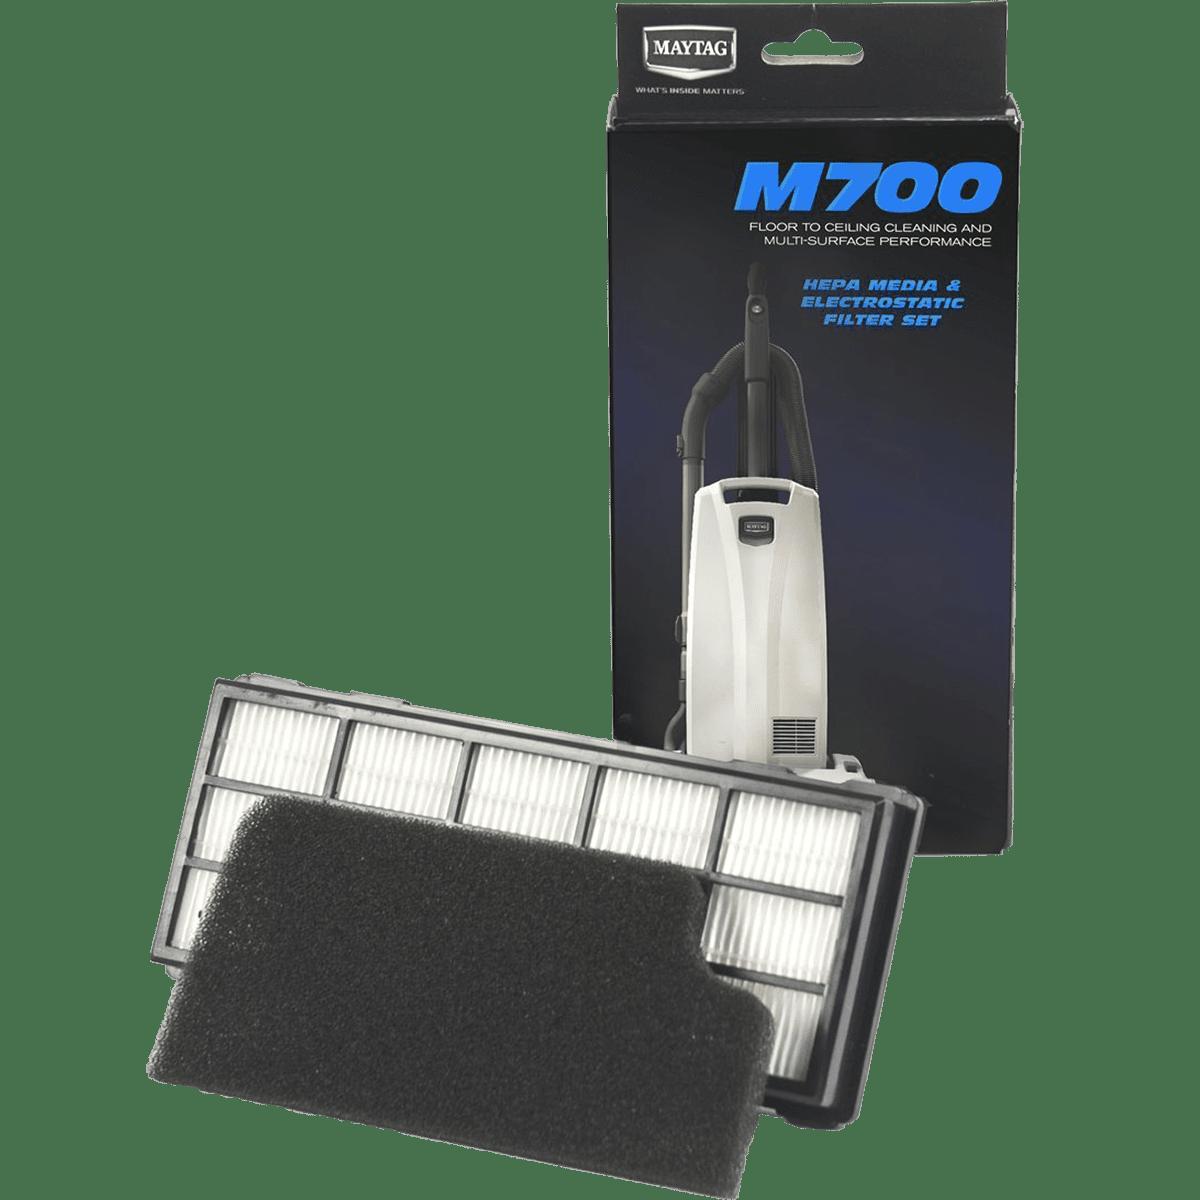 Maytag M700 HEPA Media Filter Set ma5482